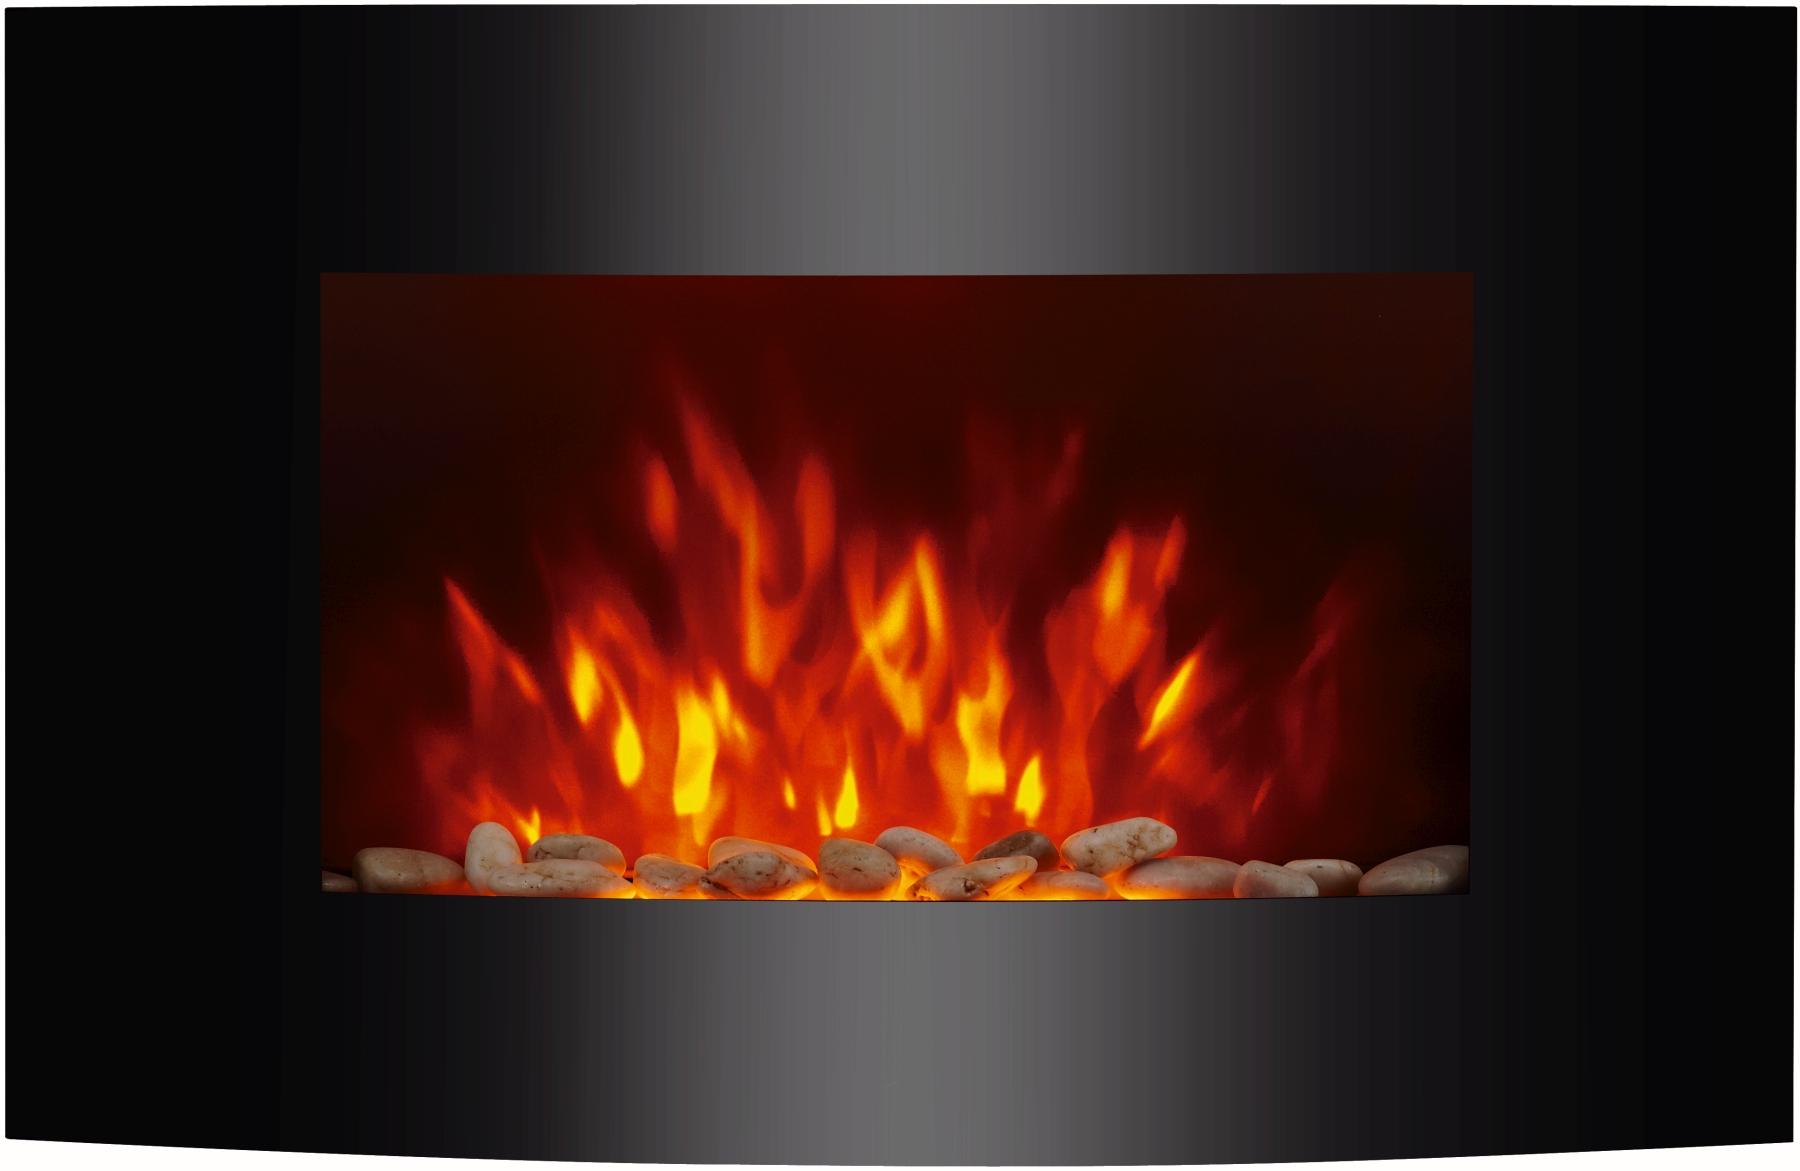 el fuego elektrokamin z rich ay619 heizung ofen kamin 1000 2000 watt mit fb neu haus garage. Black Bedroom Furniture Sets. Home Design Ideas